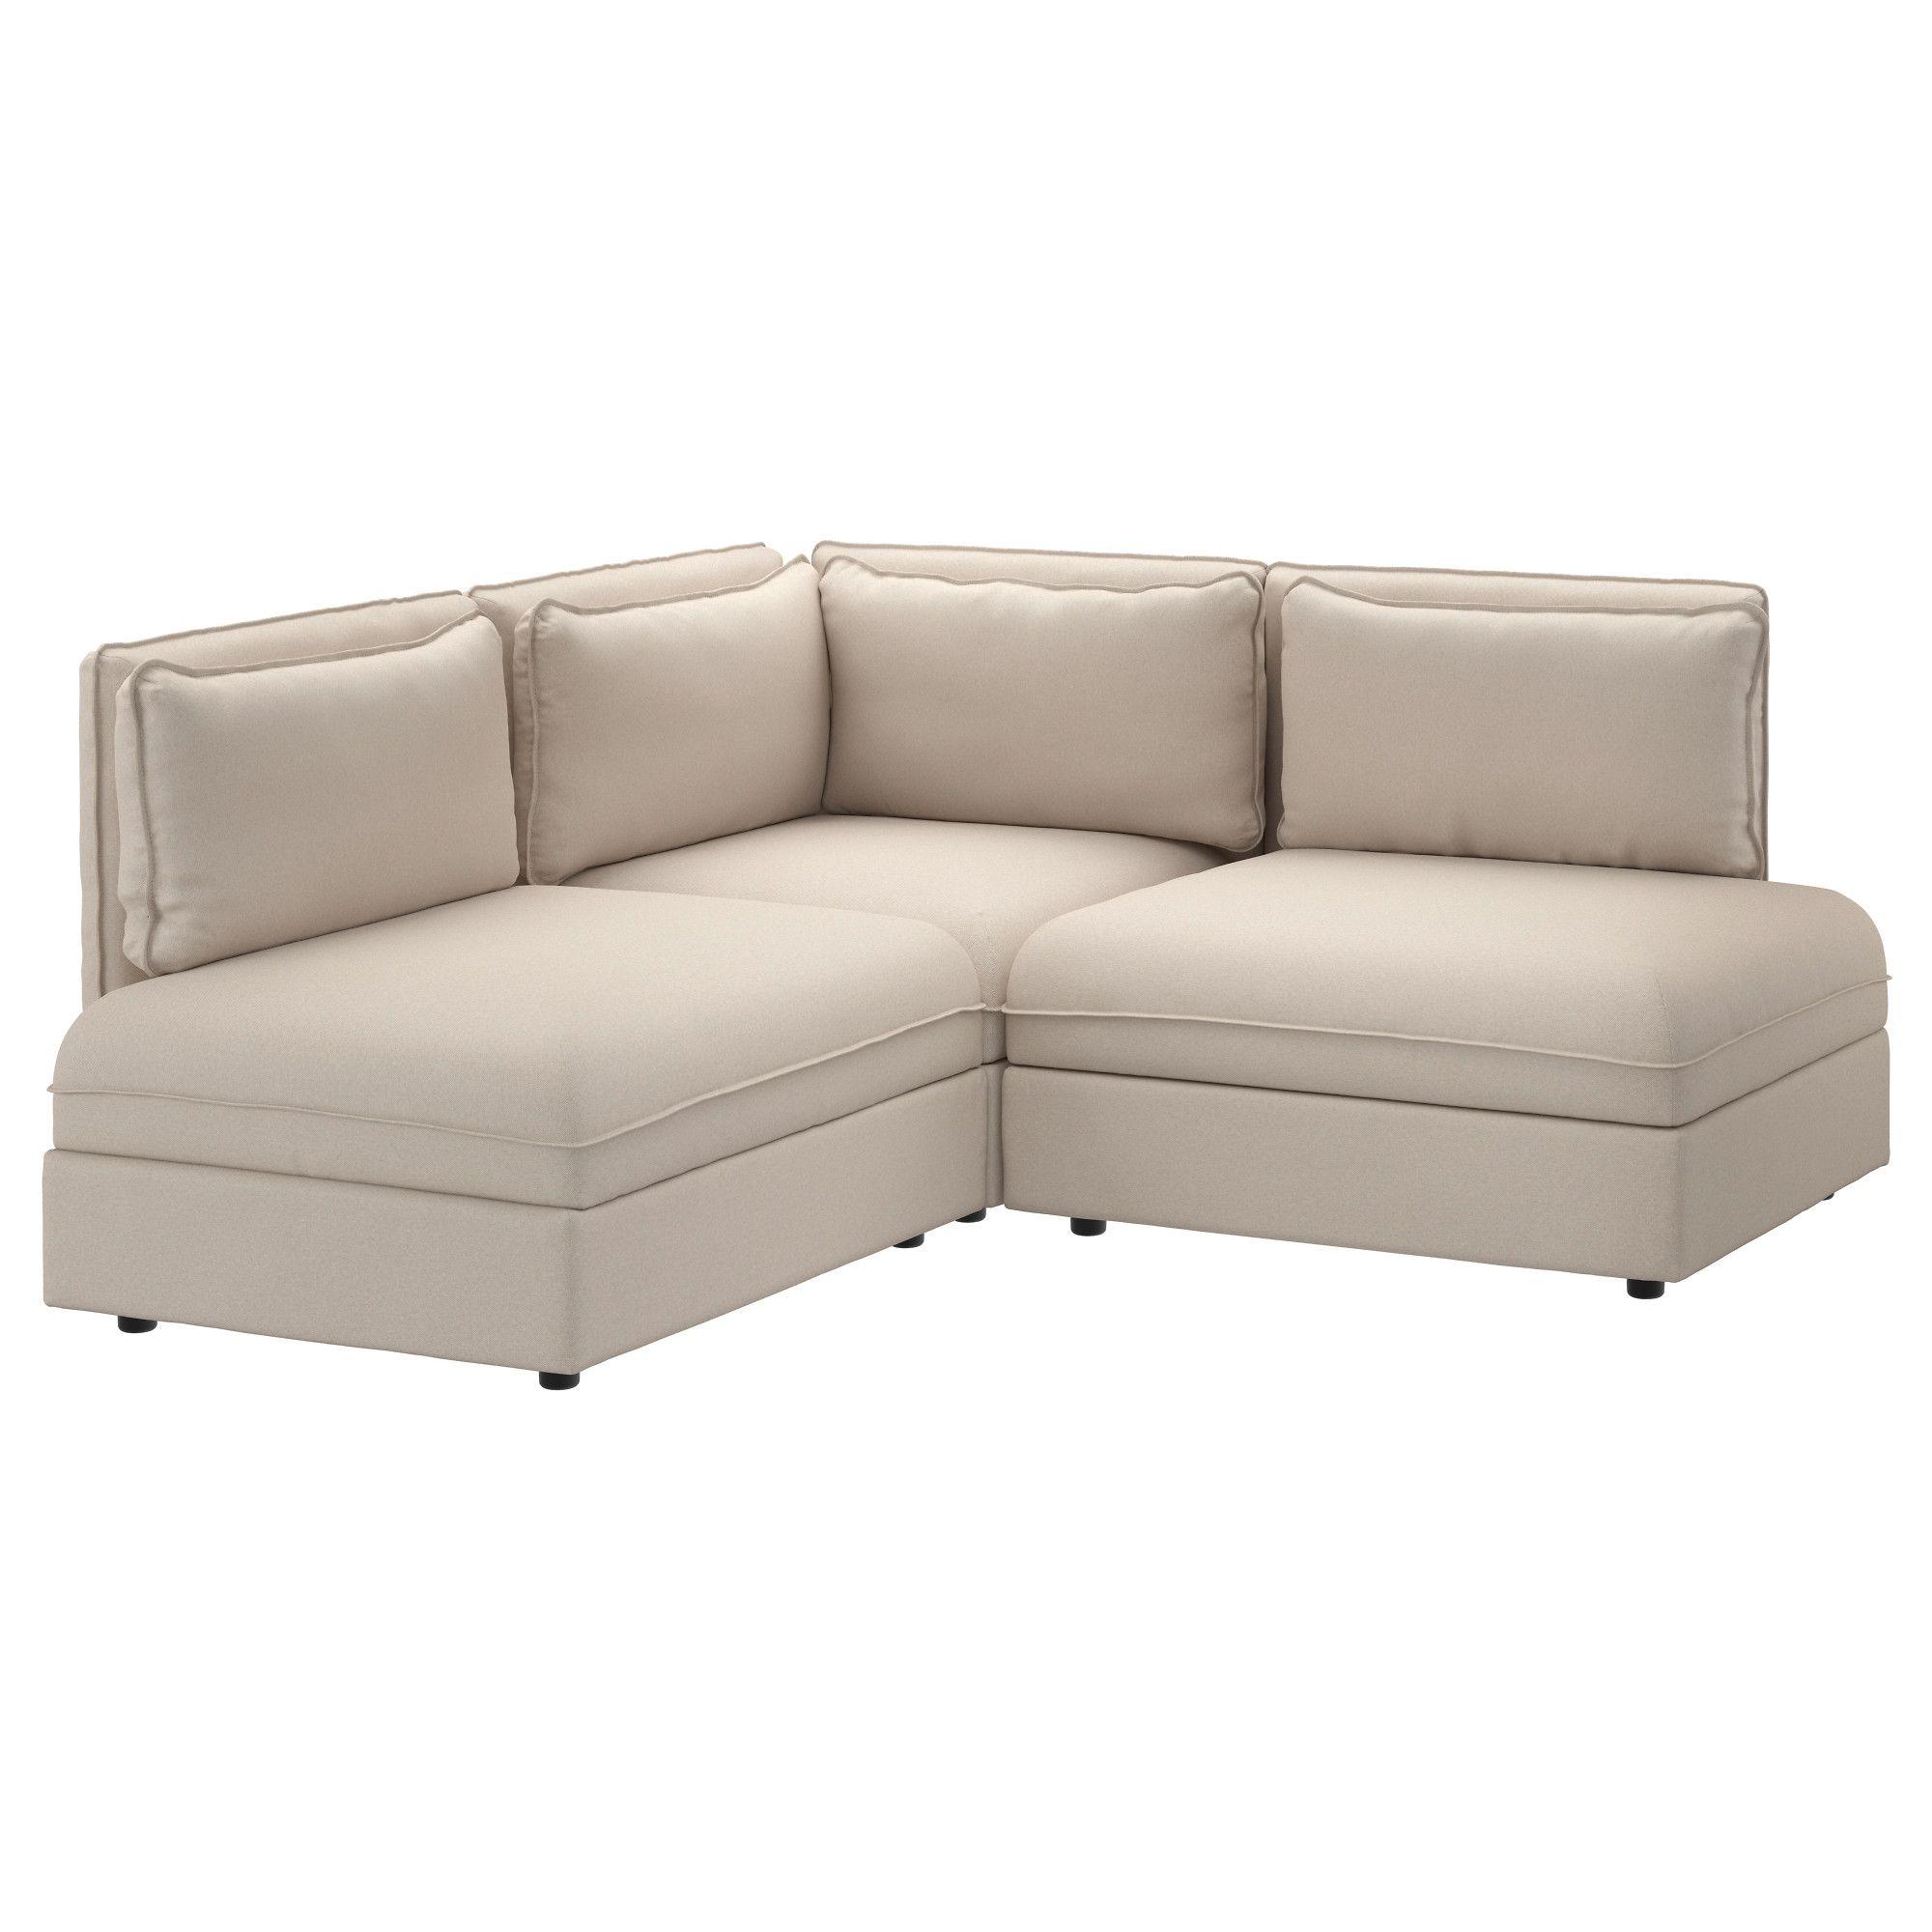 Vallentuna 3er Ecksofa Orrsta Beige Beige Jetzt Bestellen Unter Https Moebel Ladendirekt De Wohnzimmer Sof Vallentuna Small Sectional Sofa